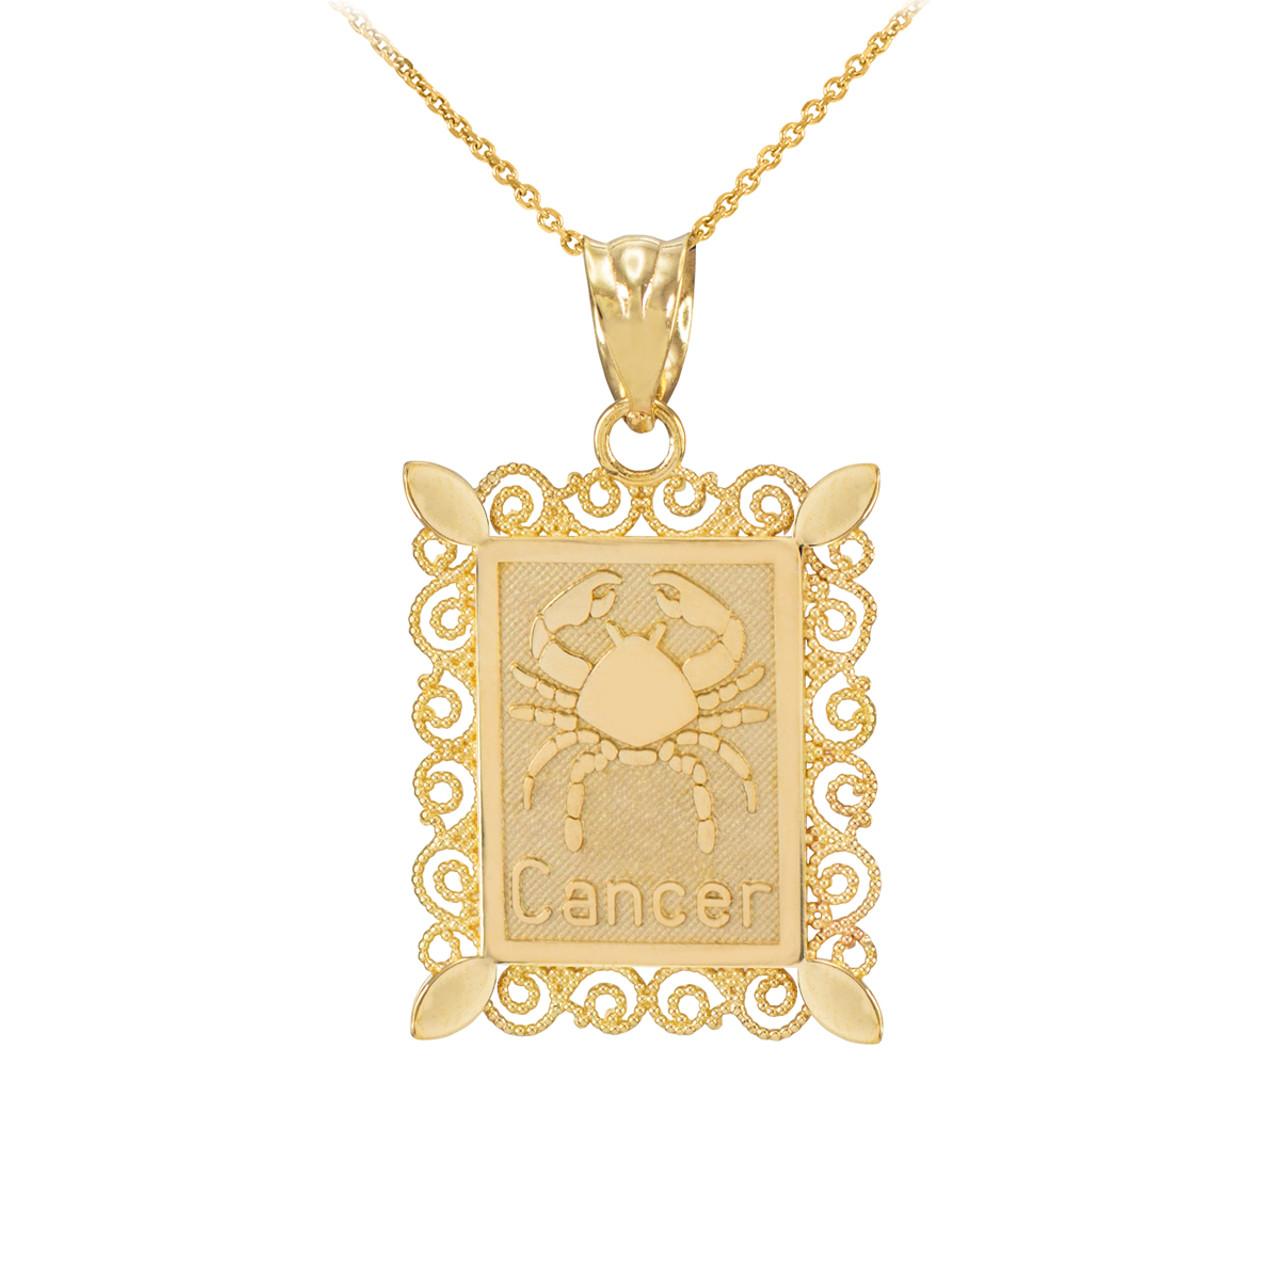 Gold cancer zodiac sign filigree pendant necklace zodiac sign pendants gold cancer zodiac sign filigree pendant necklace aloadofball Choice Image